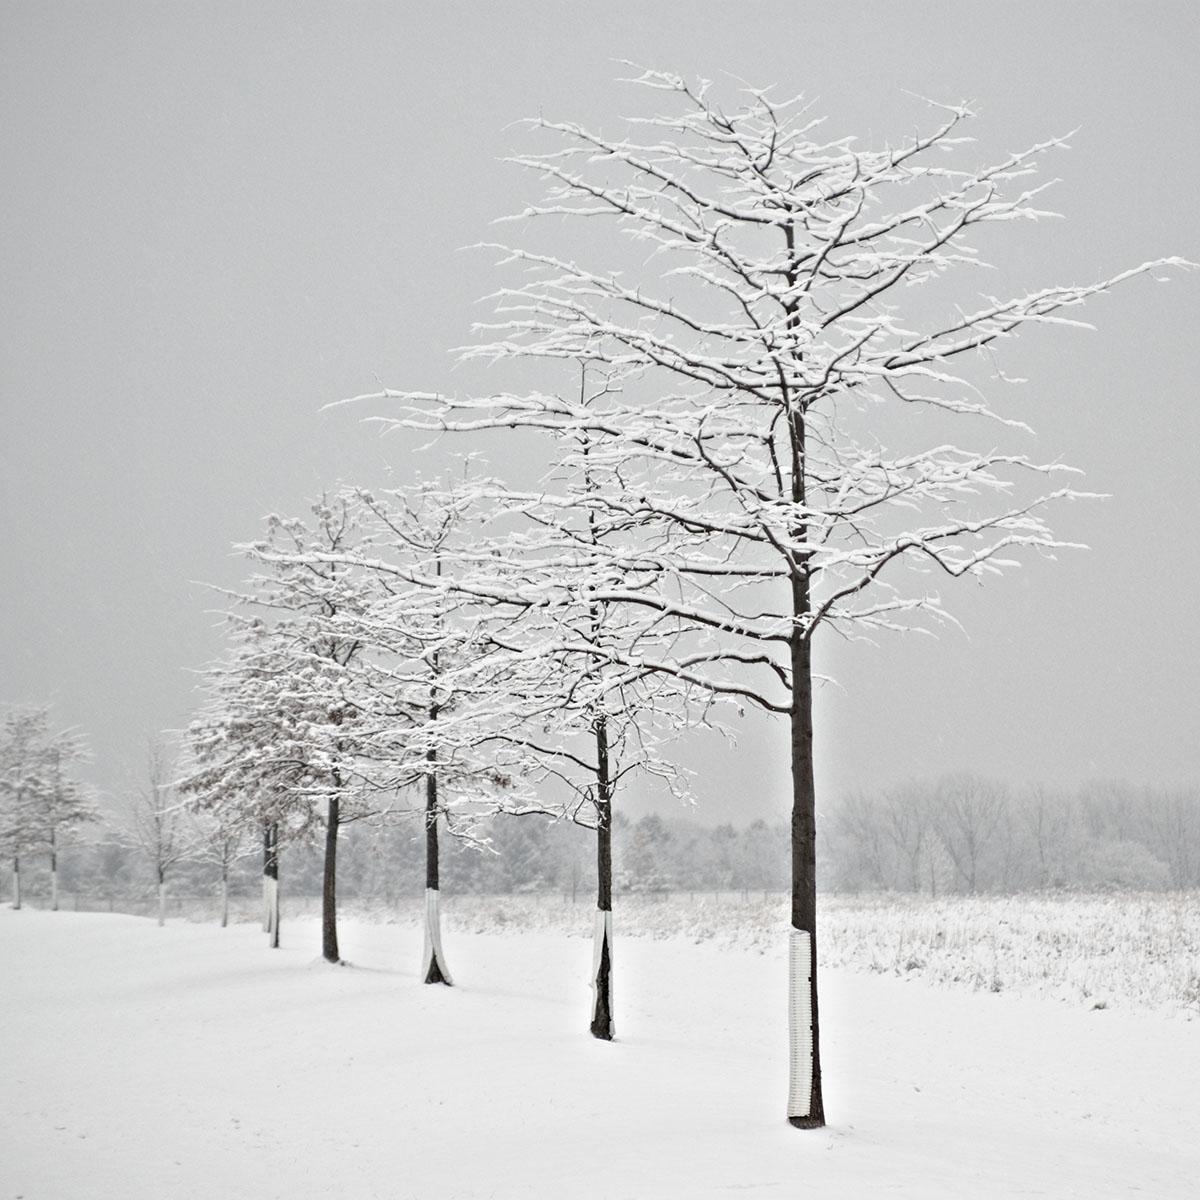 warminster_14.jpg